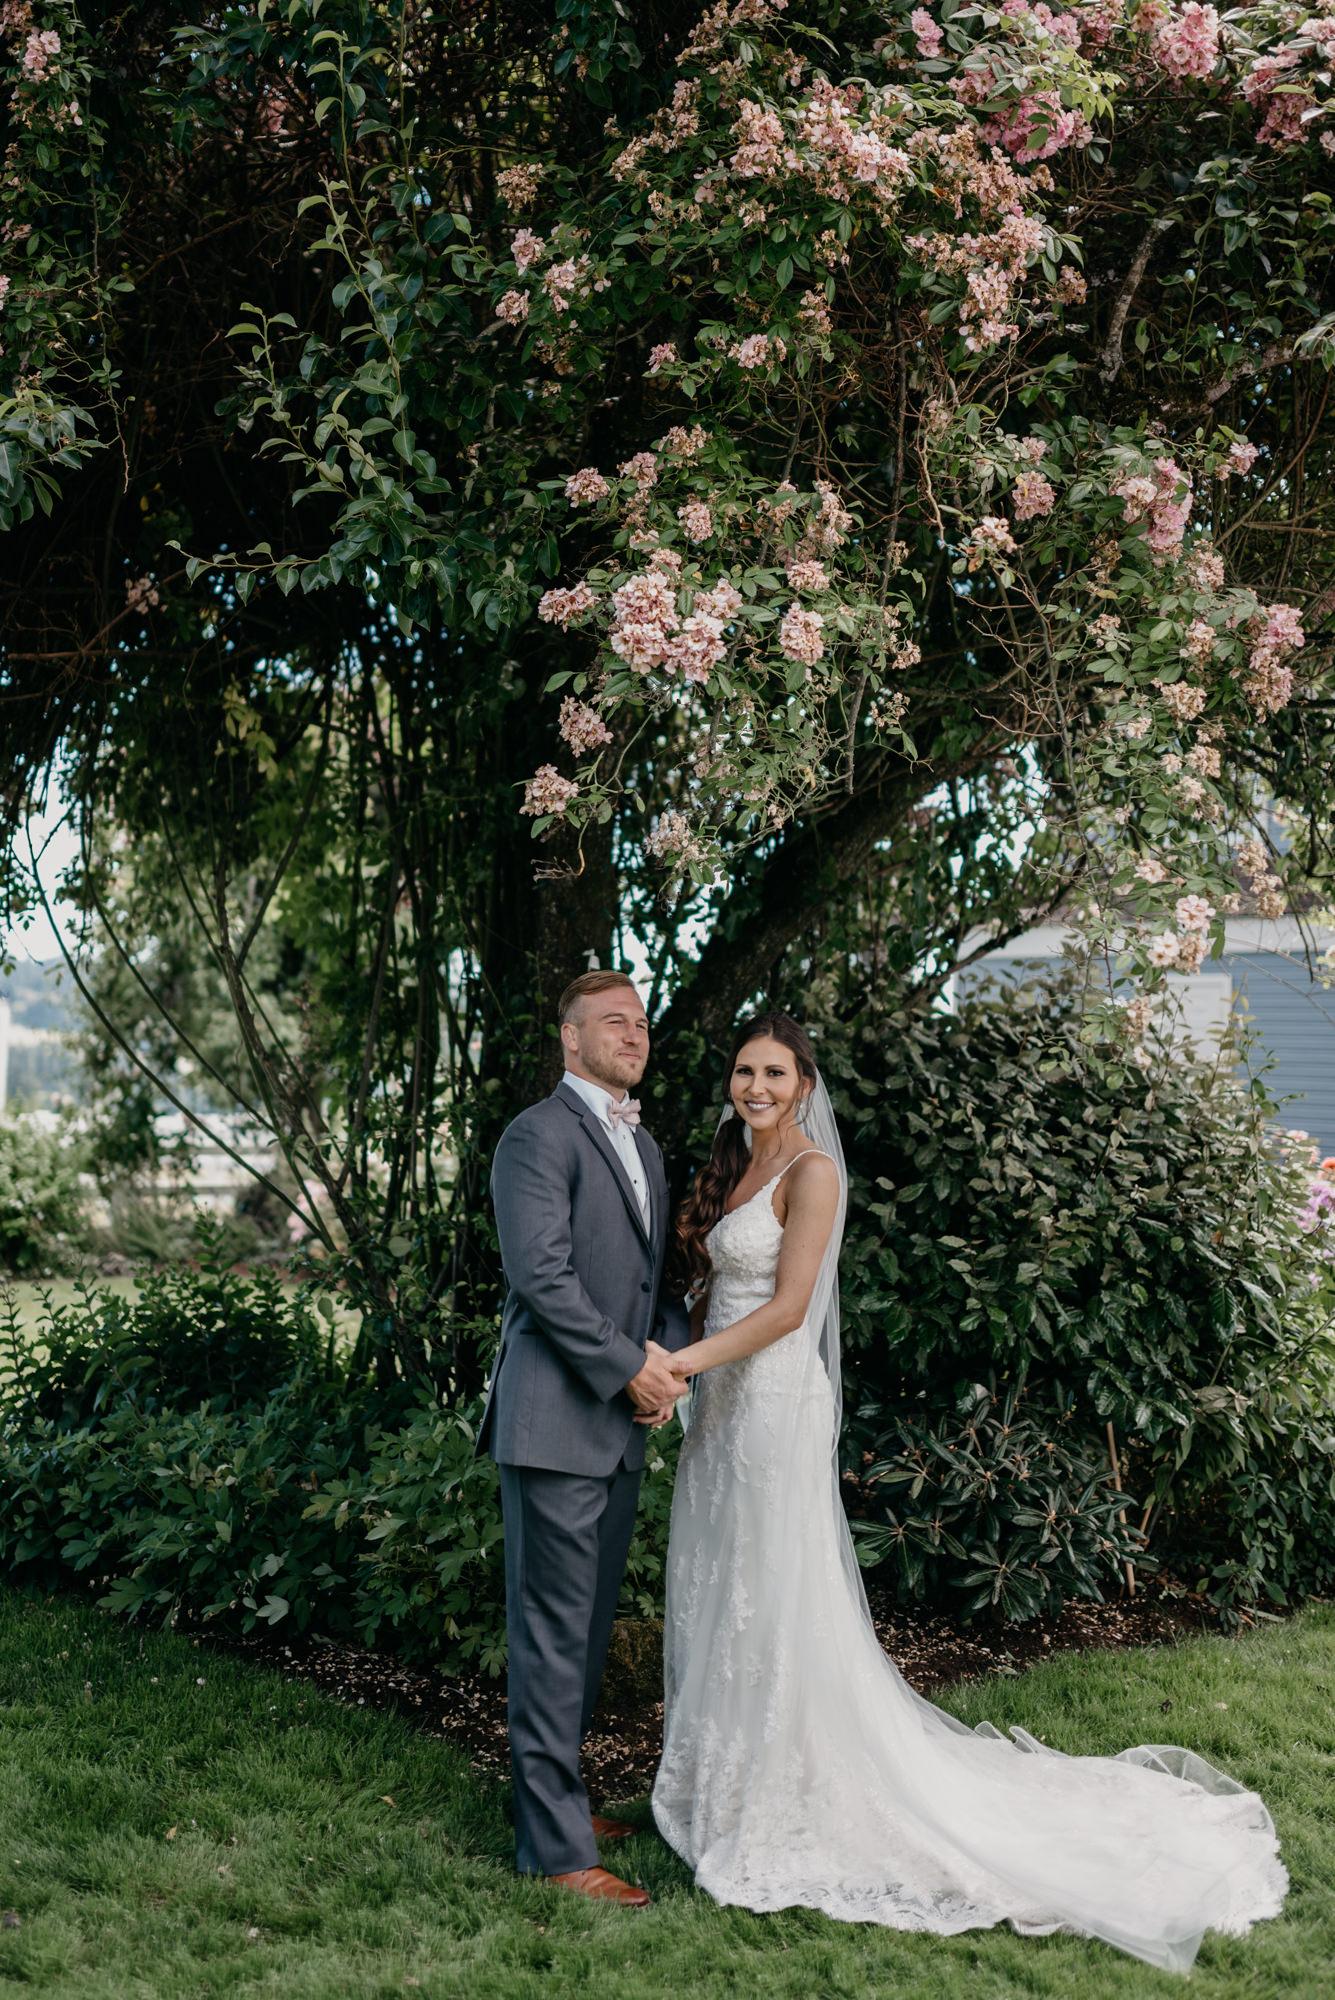 74-lake-oswego-wedding-portland-couple-rose-tree.jpg